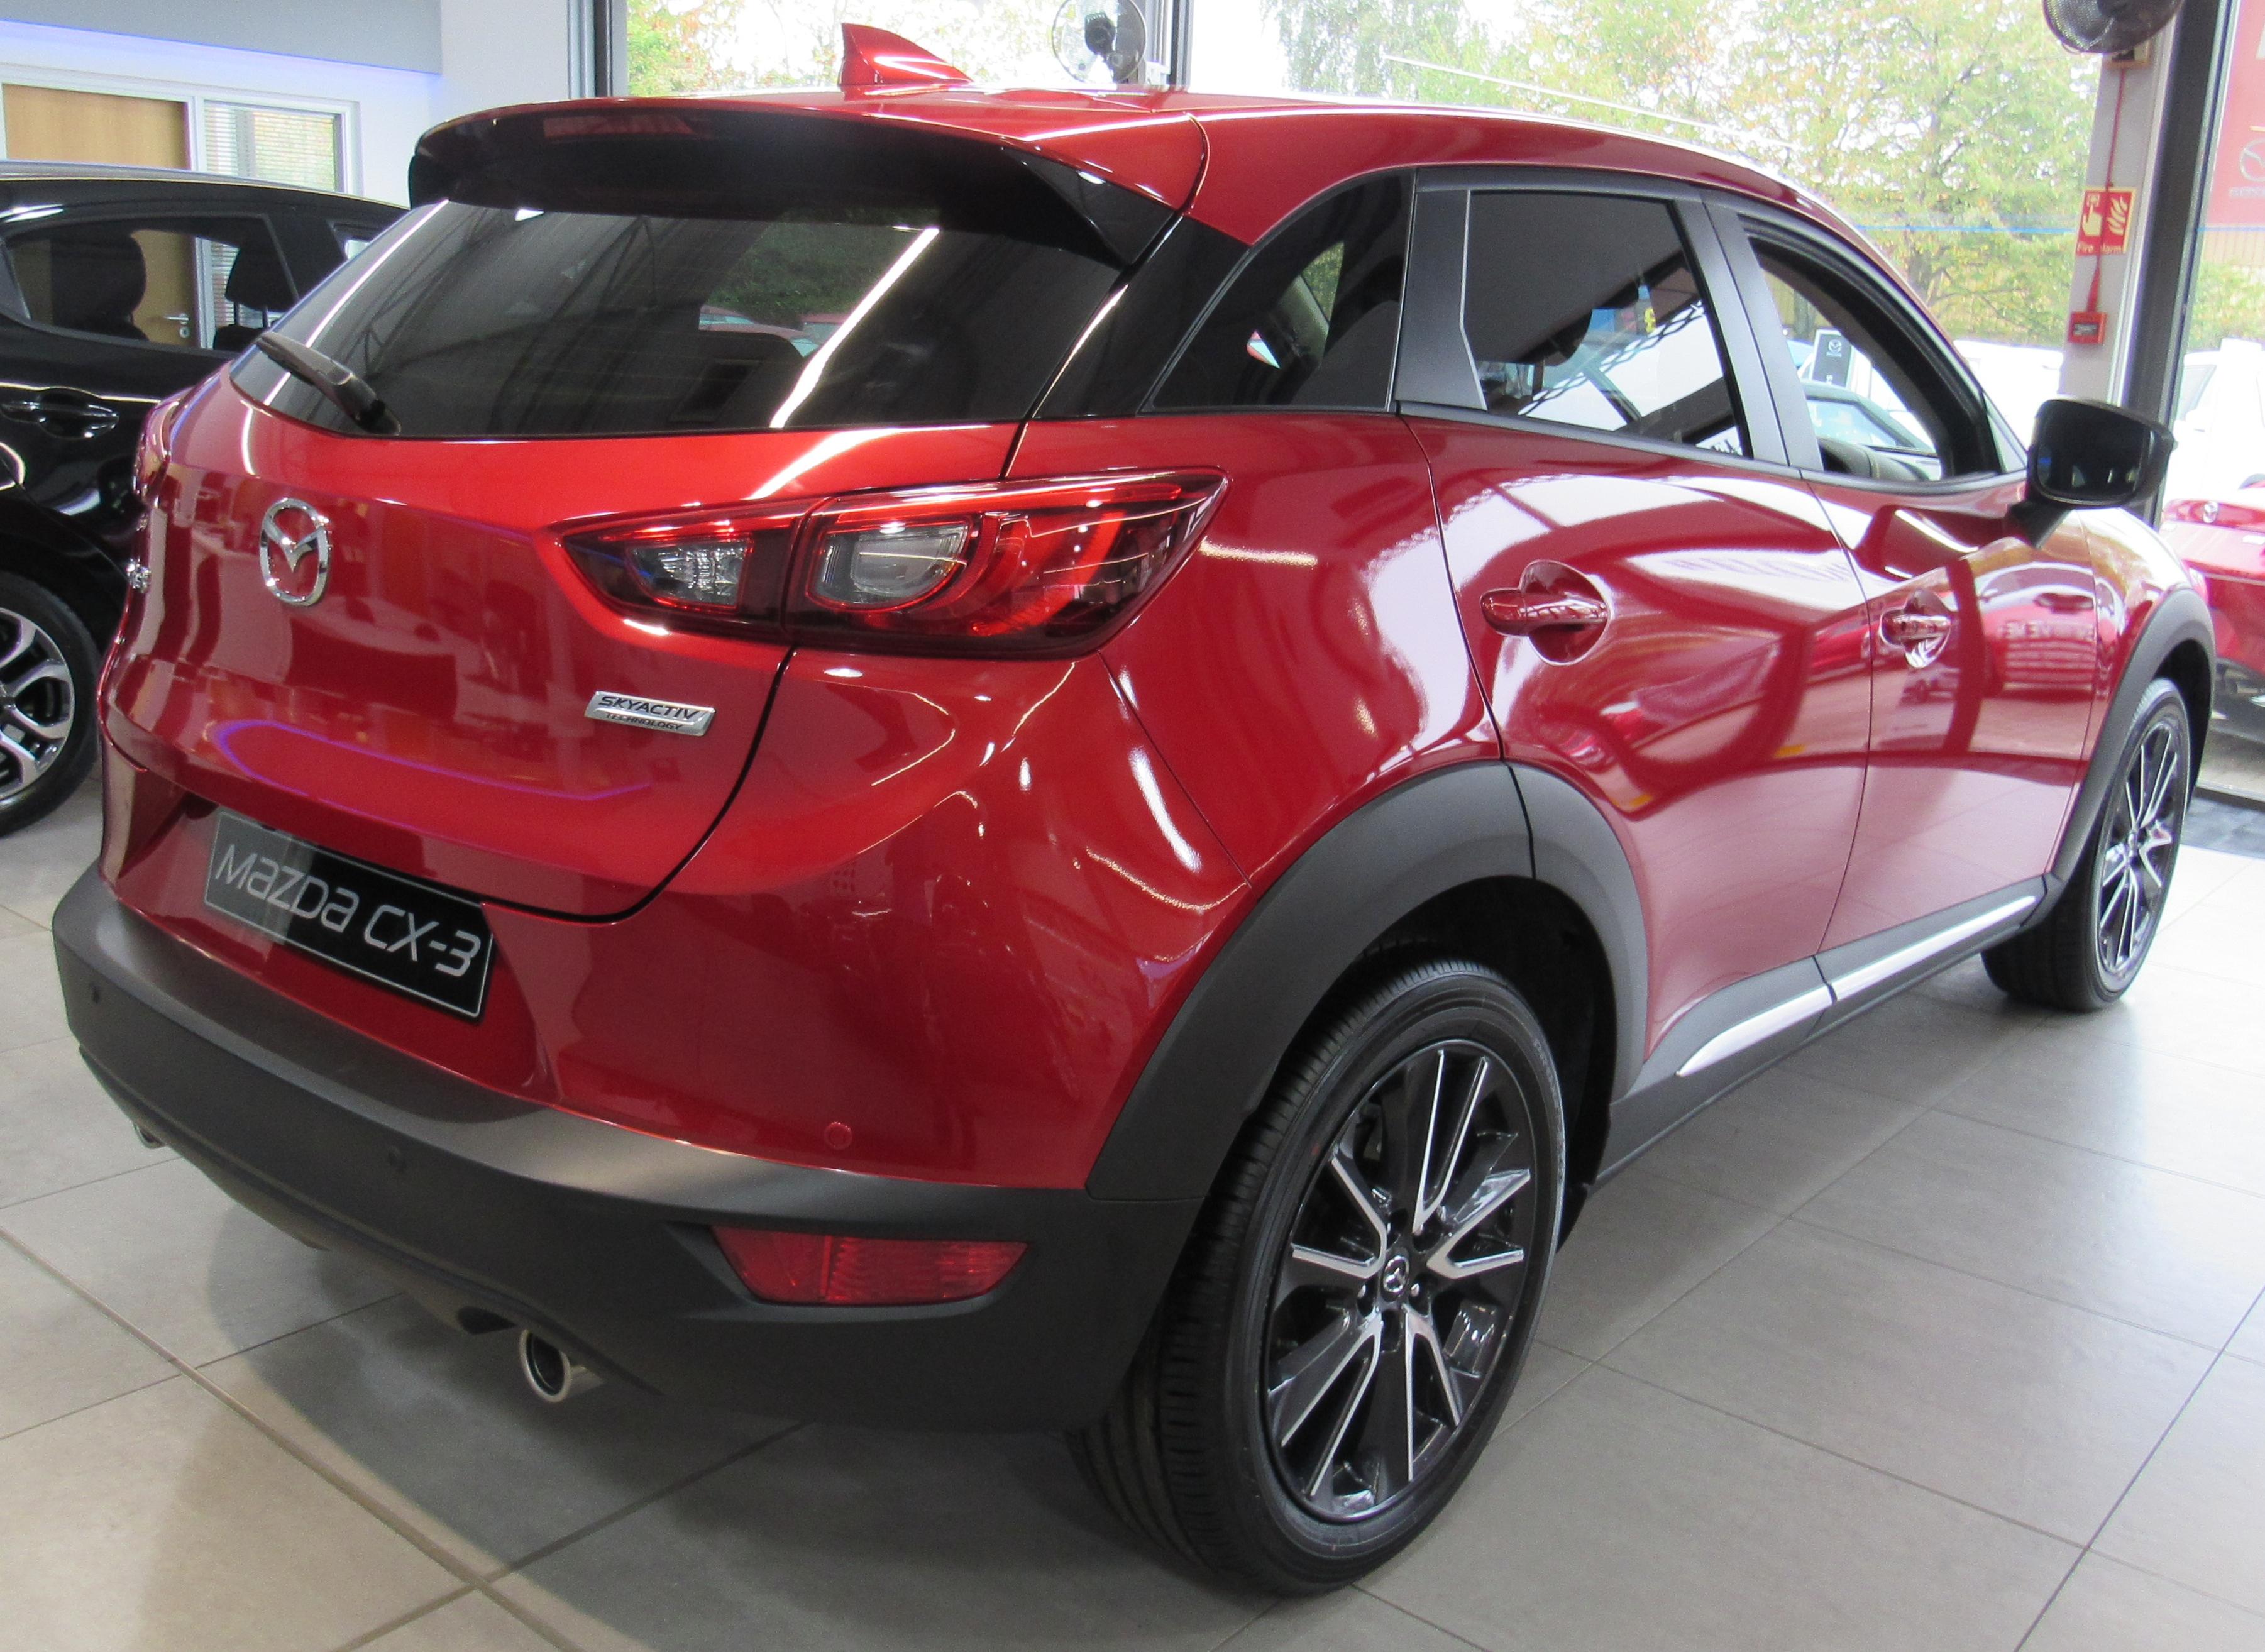 Kelebihan Kekurangan Mazda Cx 3 Skyactiv Tangguh